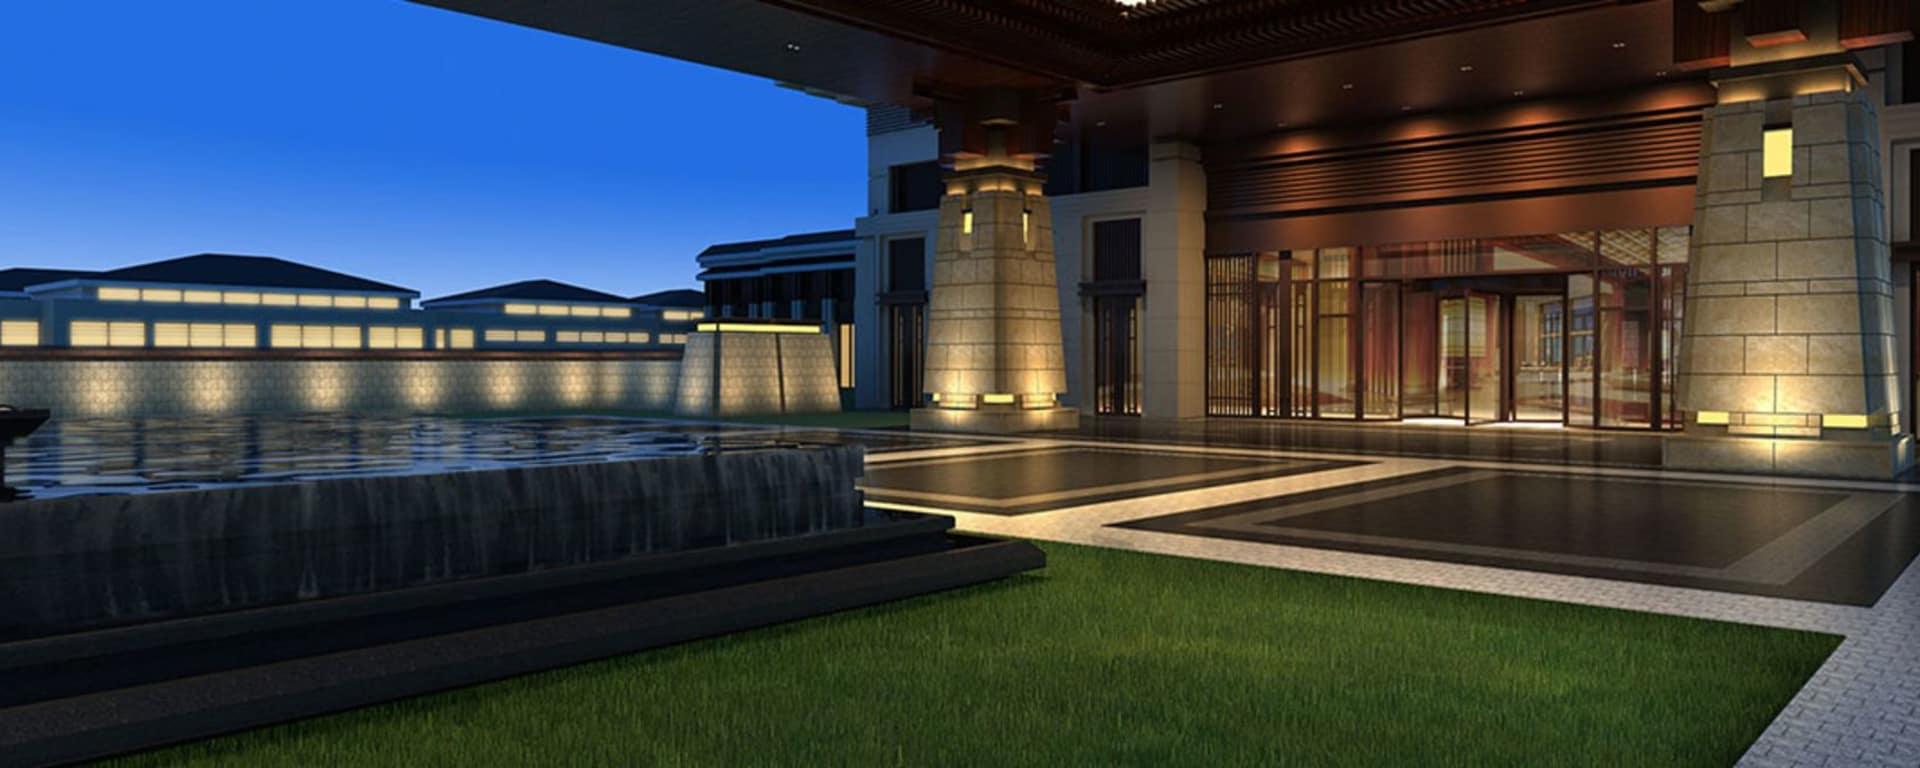 Hyatt Regency in Xian: Exterior